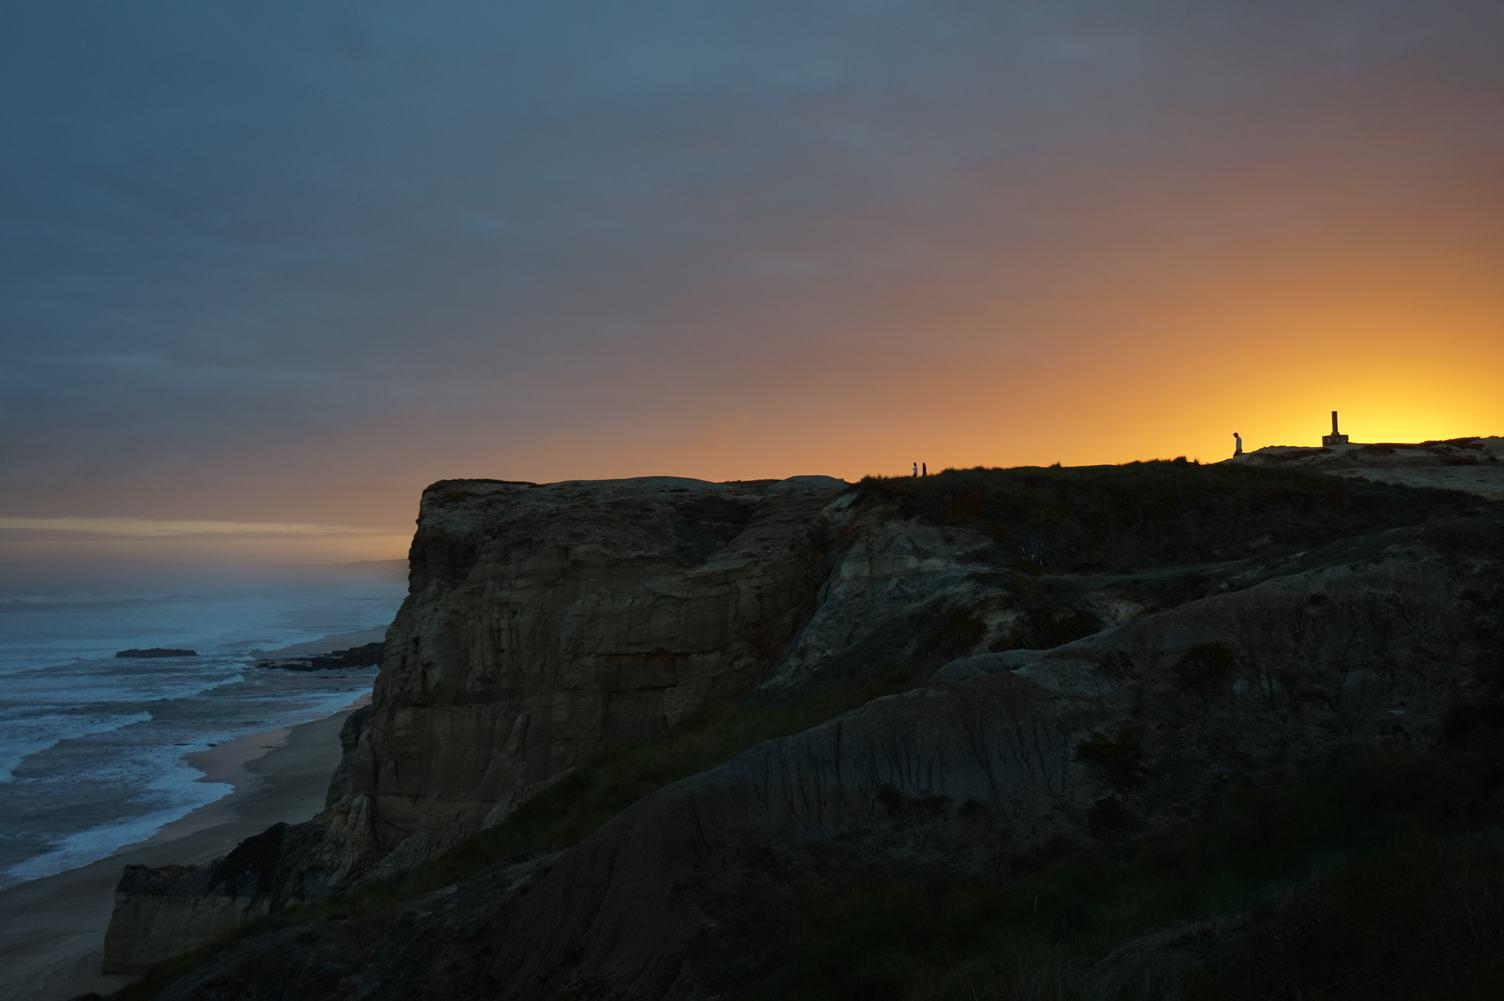 Sunset at the Coastline